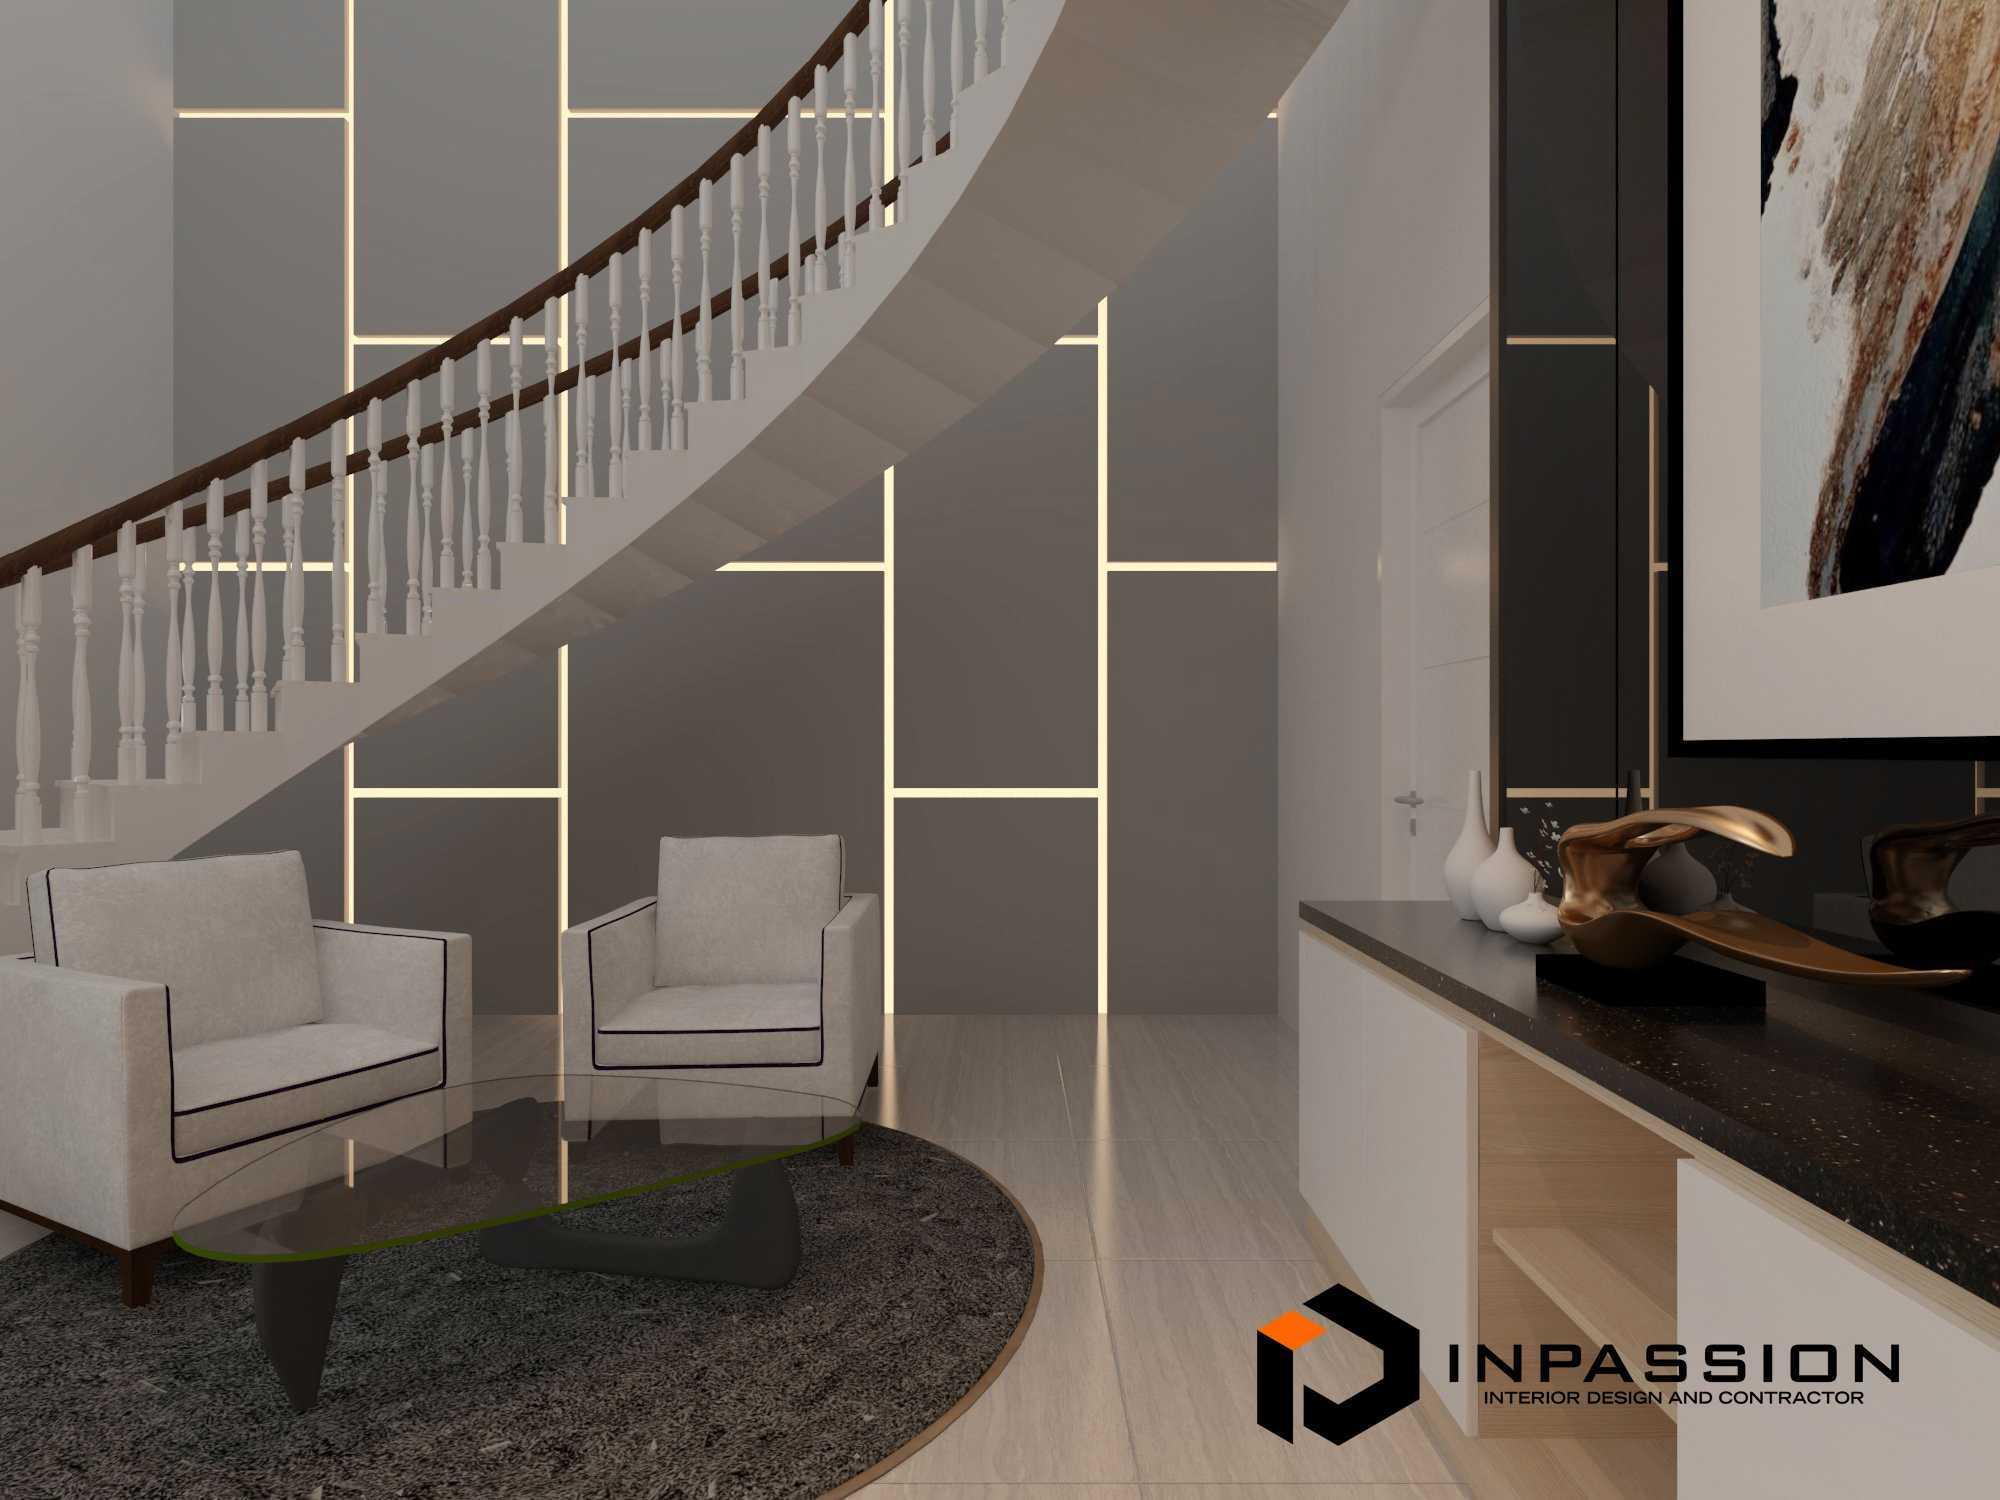 Inpassion Interior Design Rumah Margorejo Surabaya, Kota Sby, Jawa Timur, Indonesia Surabaya, Kota Sby, Jawa Timur, Indonesia Inpassion-Interior-Design-Rumah-Margorejo  80808